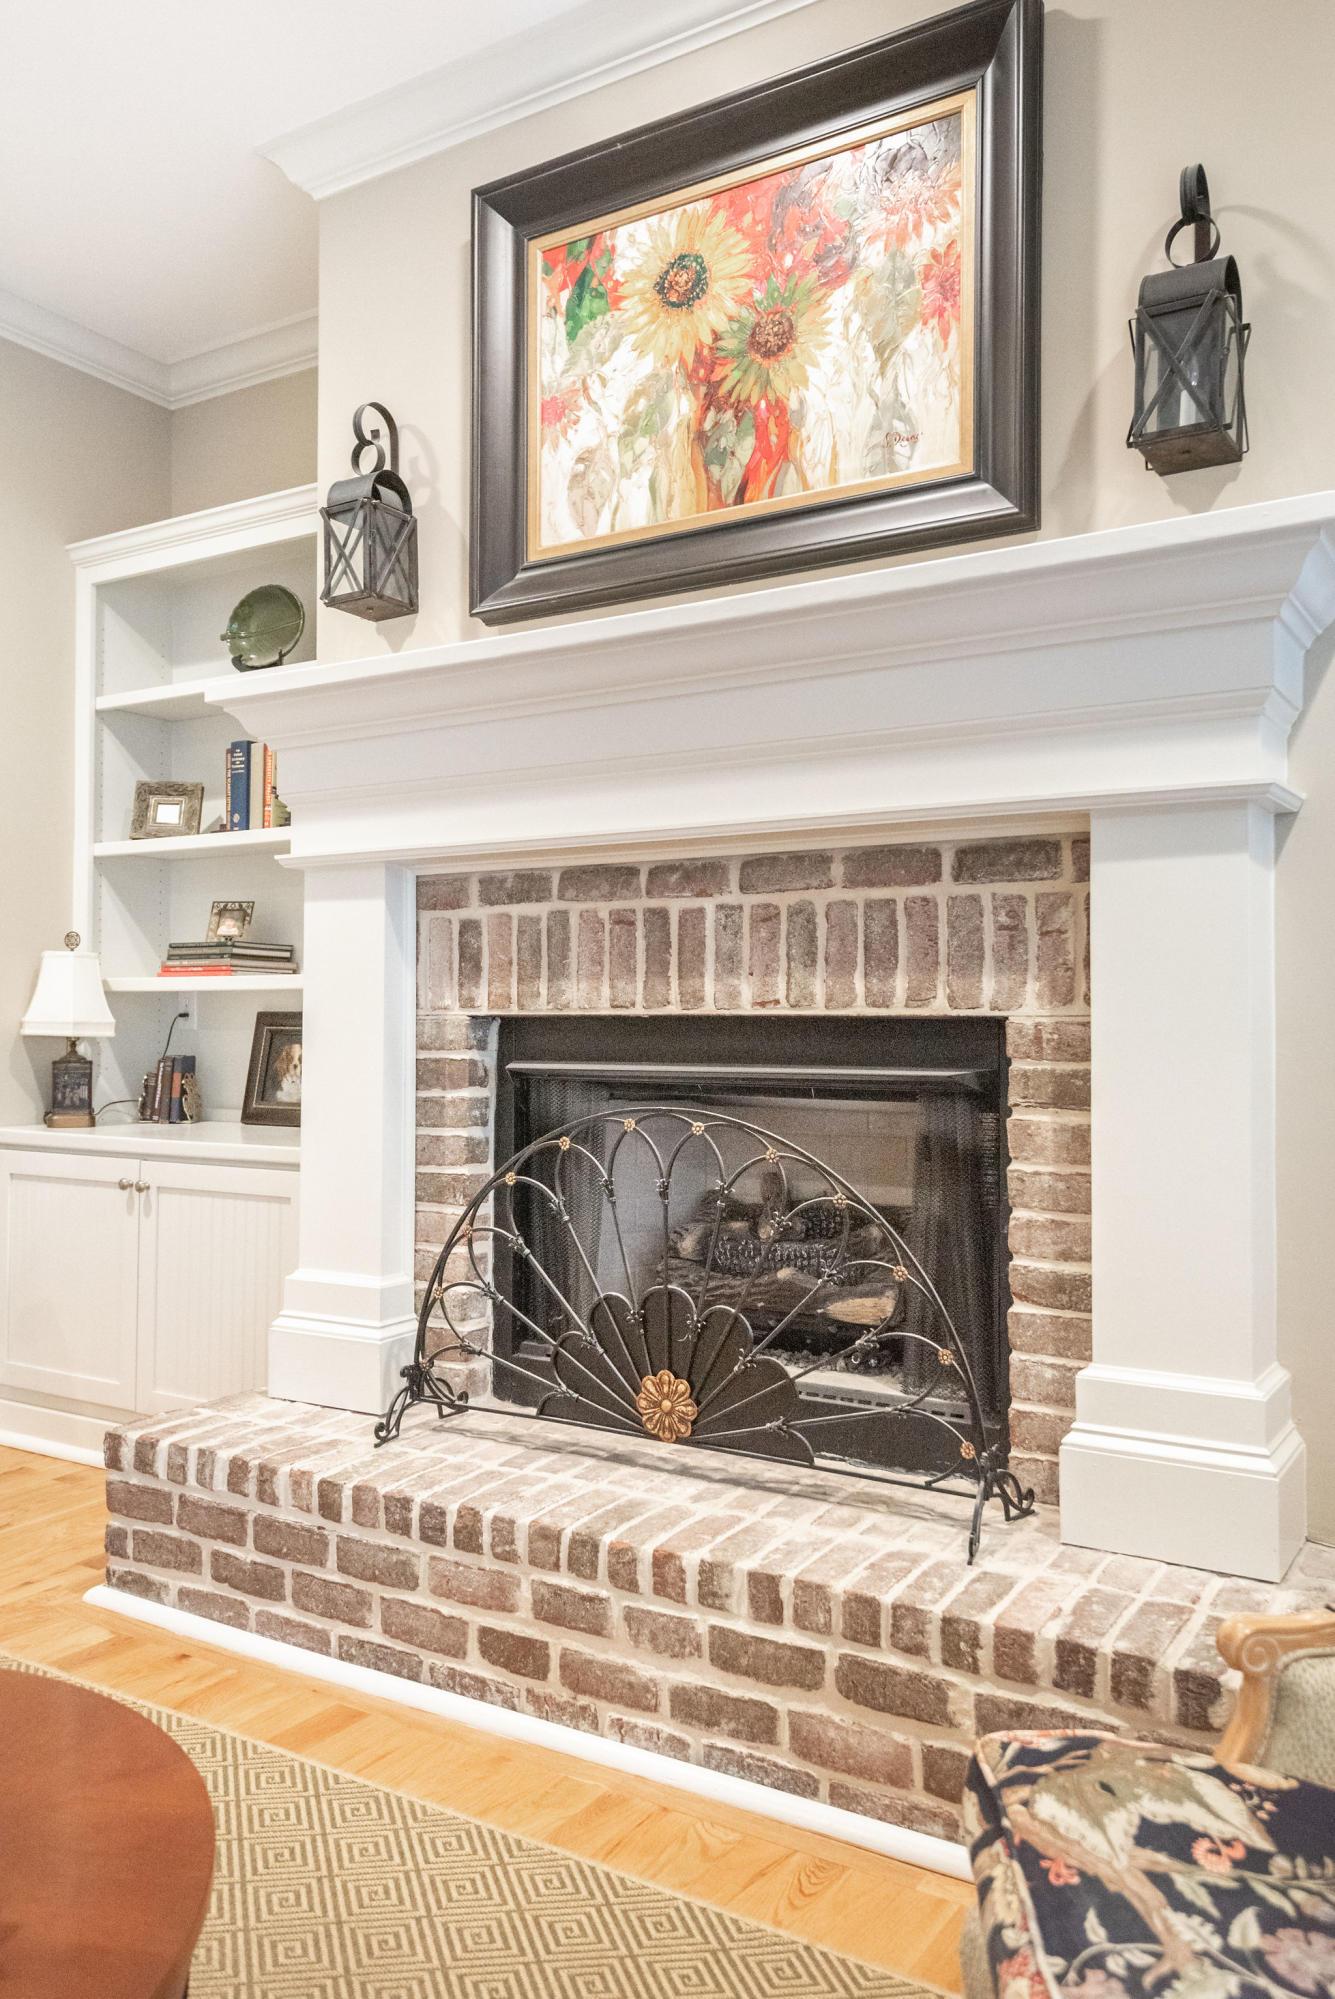 Dunes West Homes For Sale - 1305 King Bird, Mount Pleasant, SC - 57